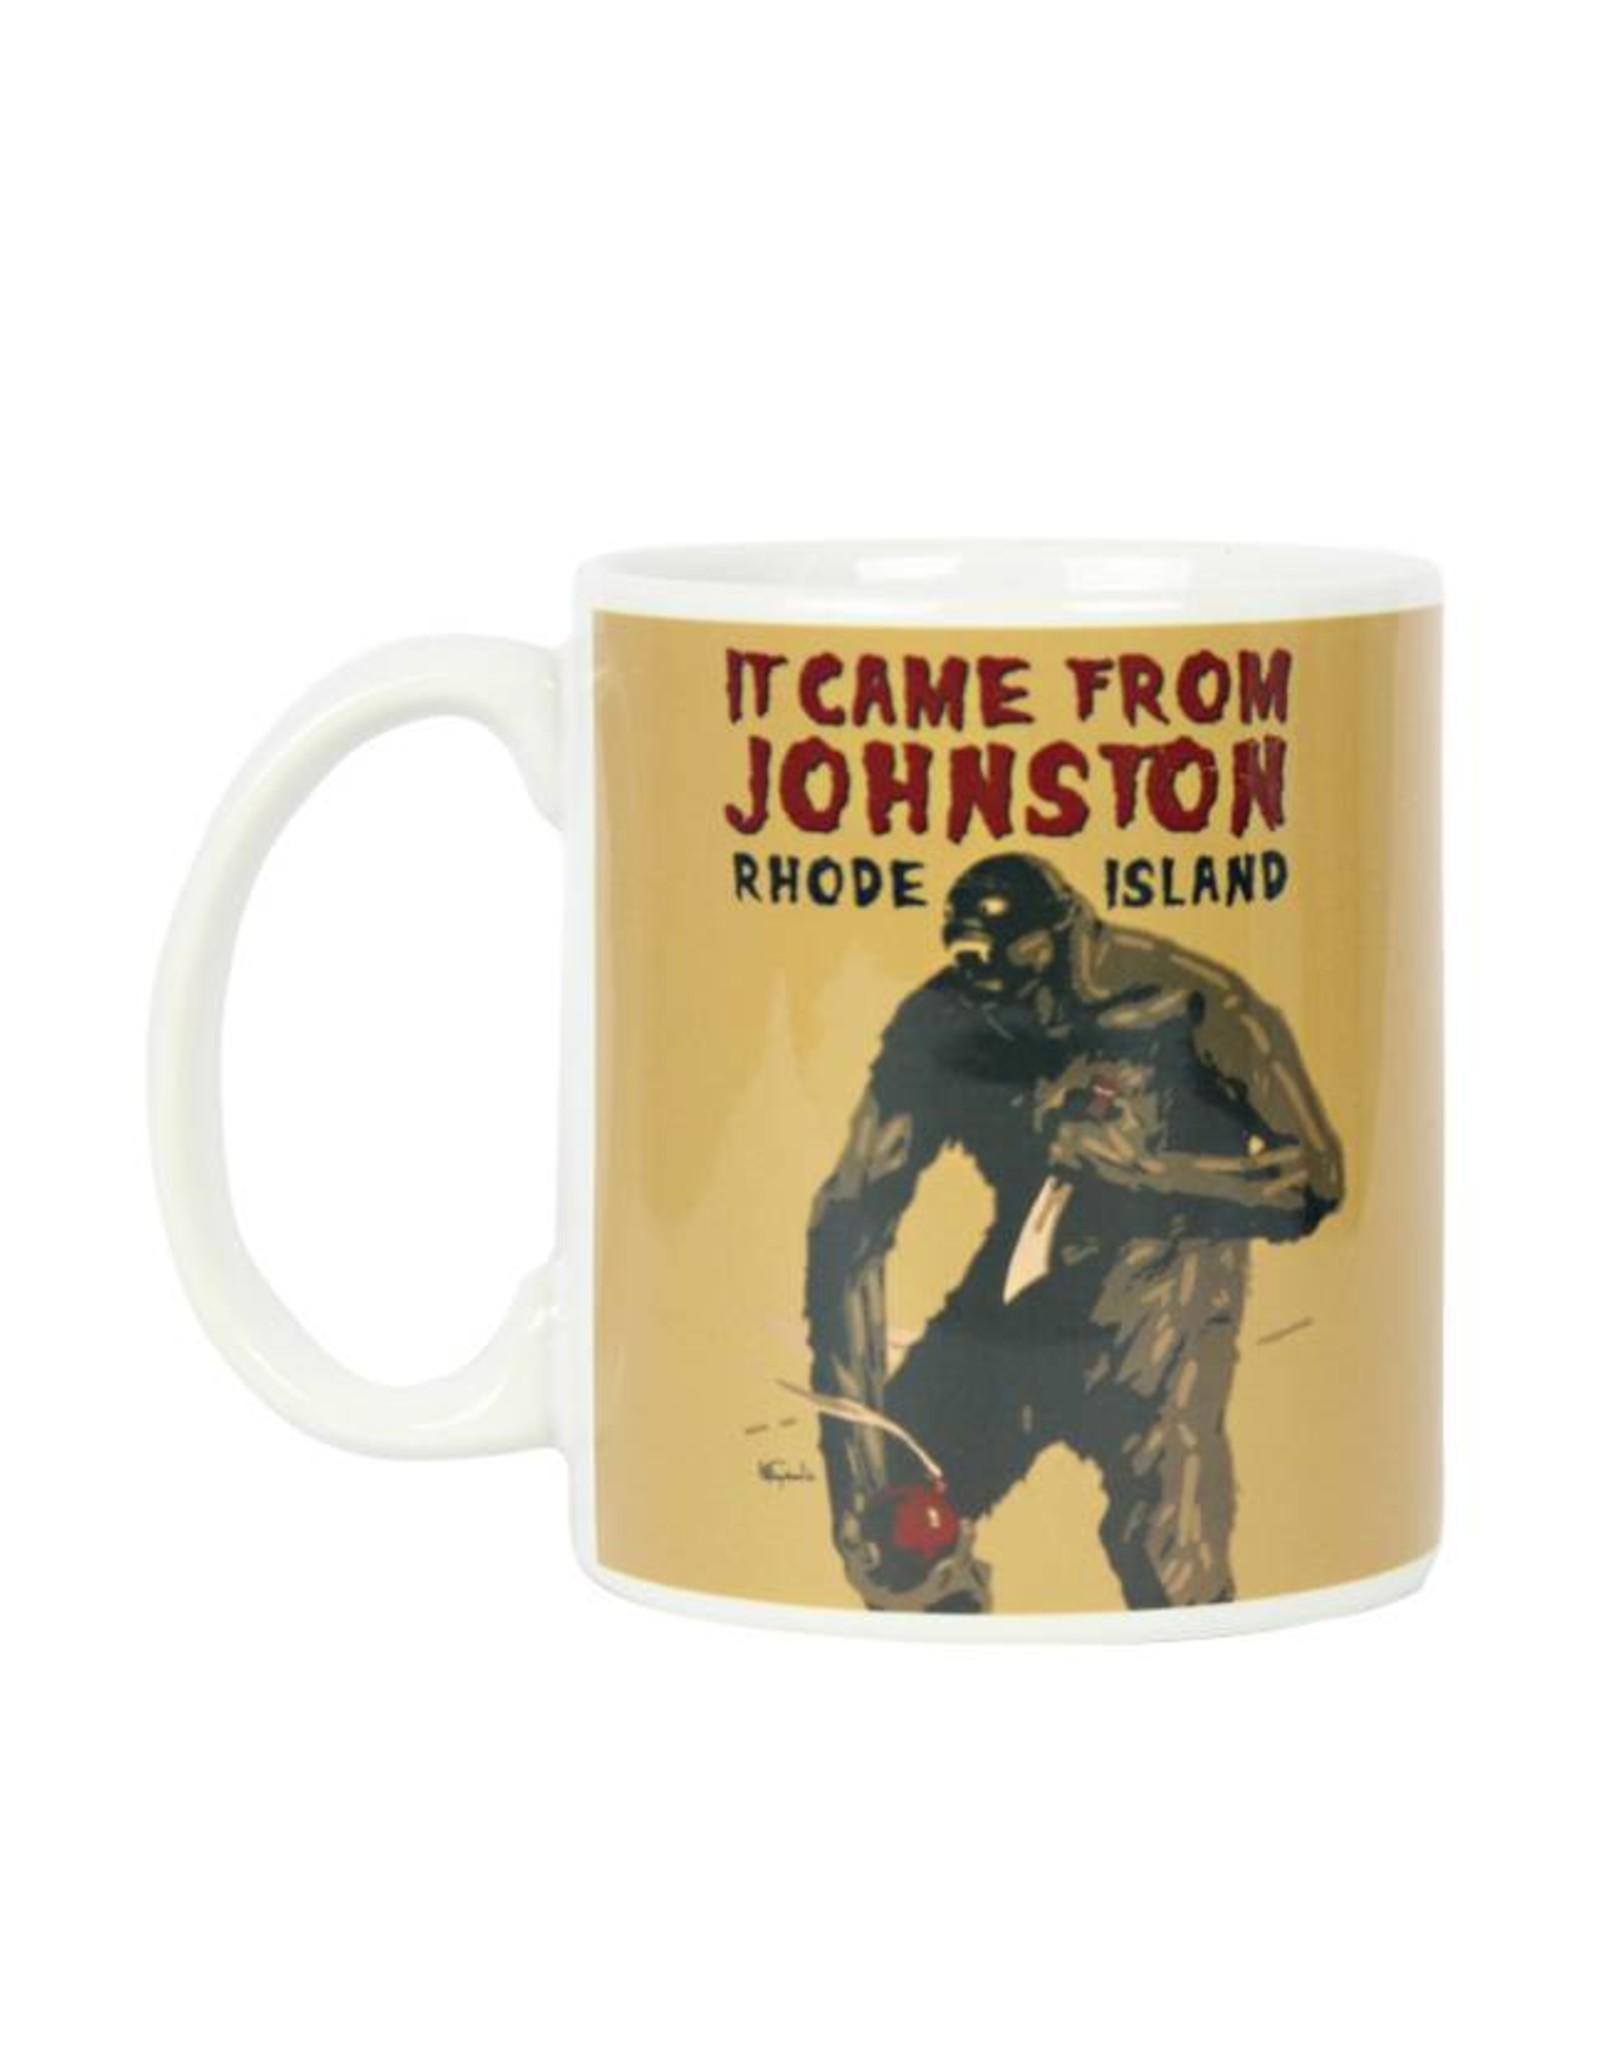 Frog & Toad Design It Came From Johnston Mug